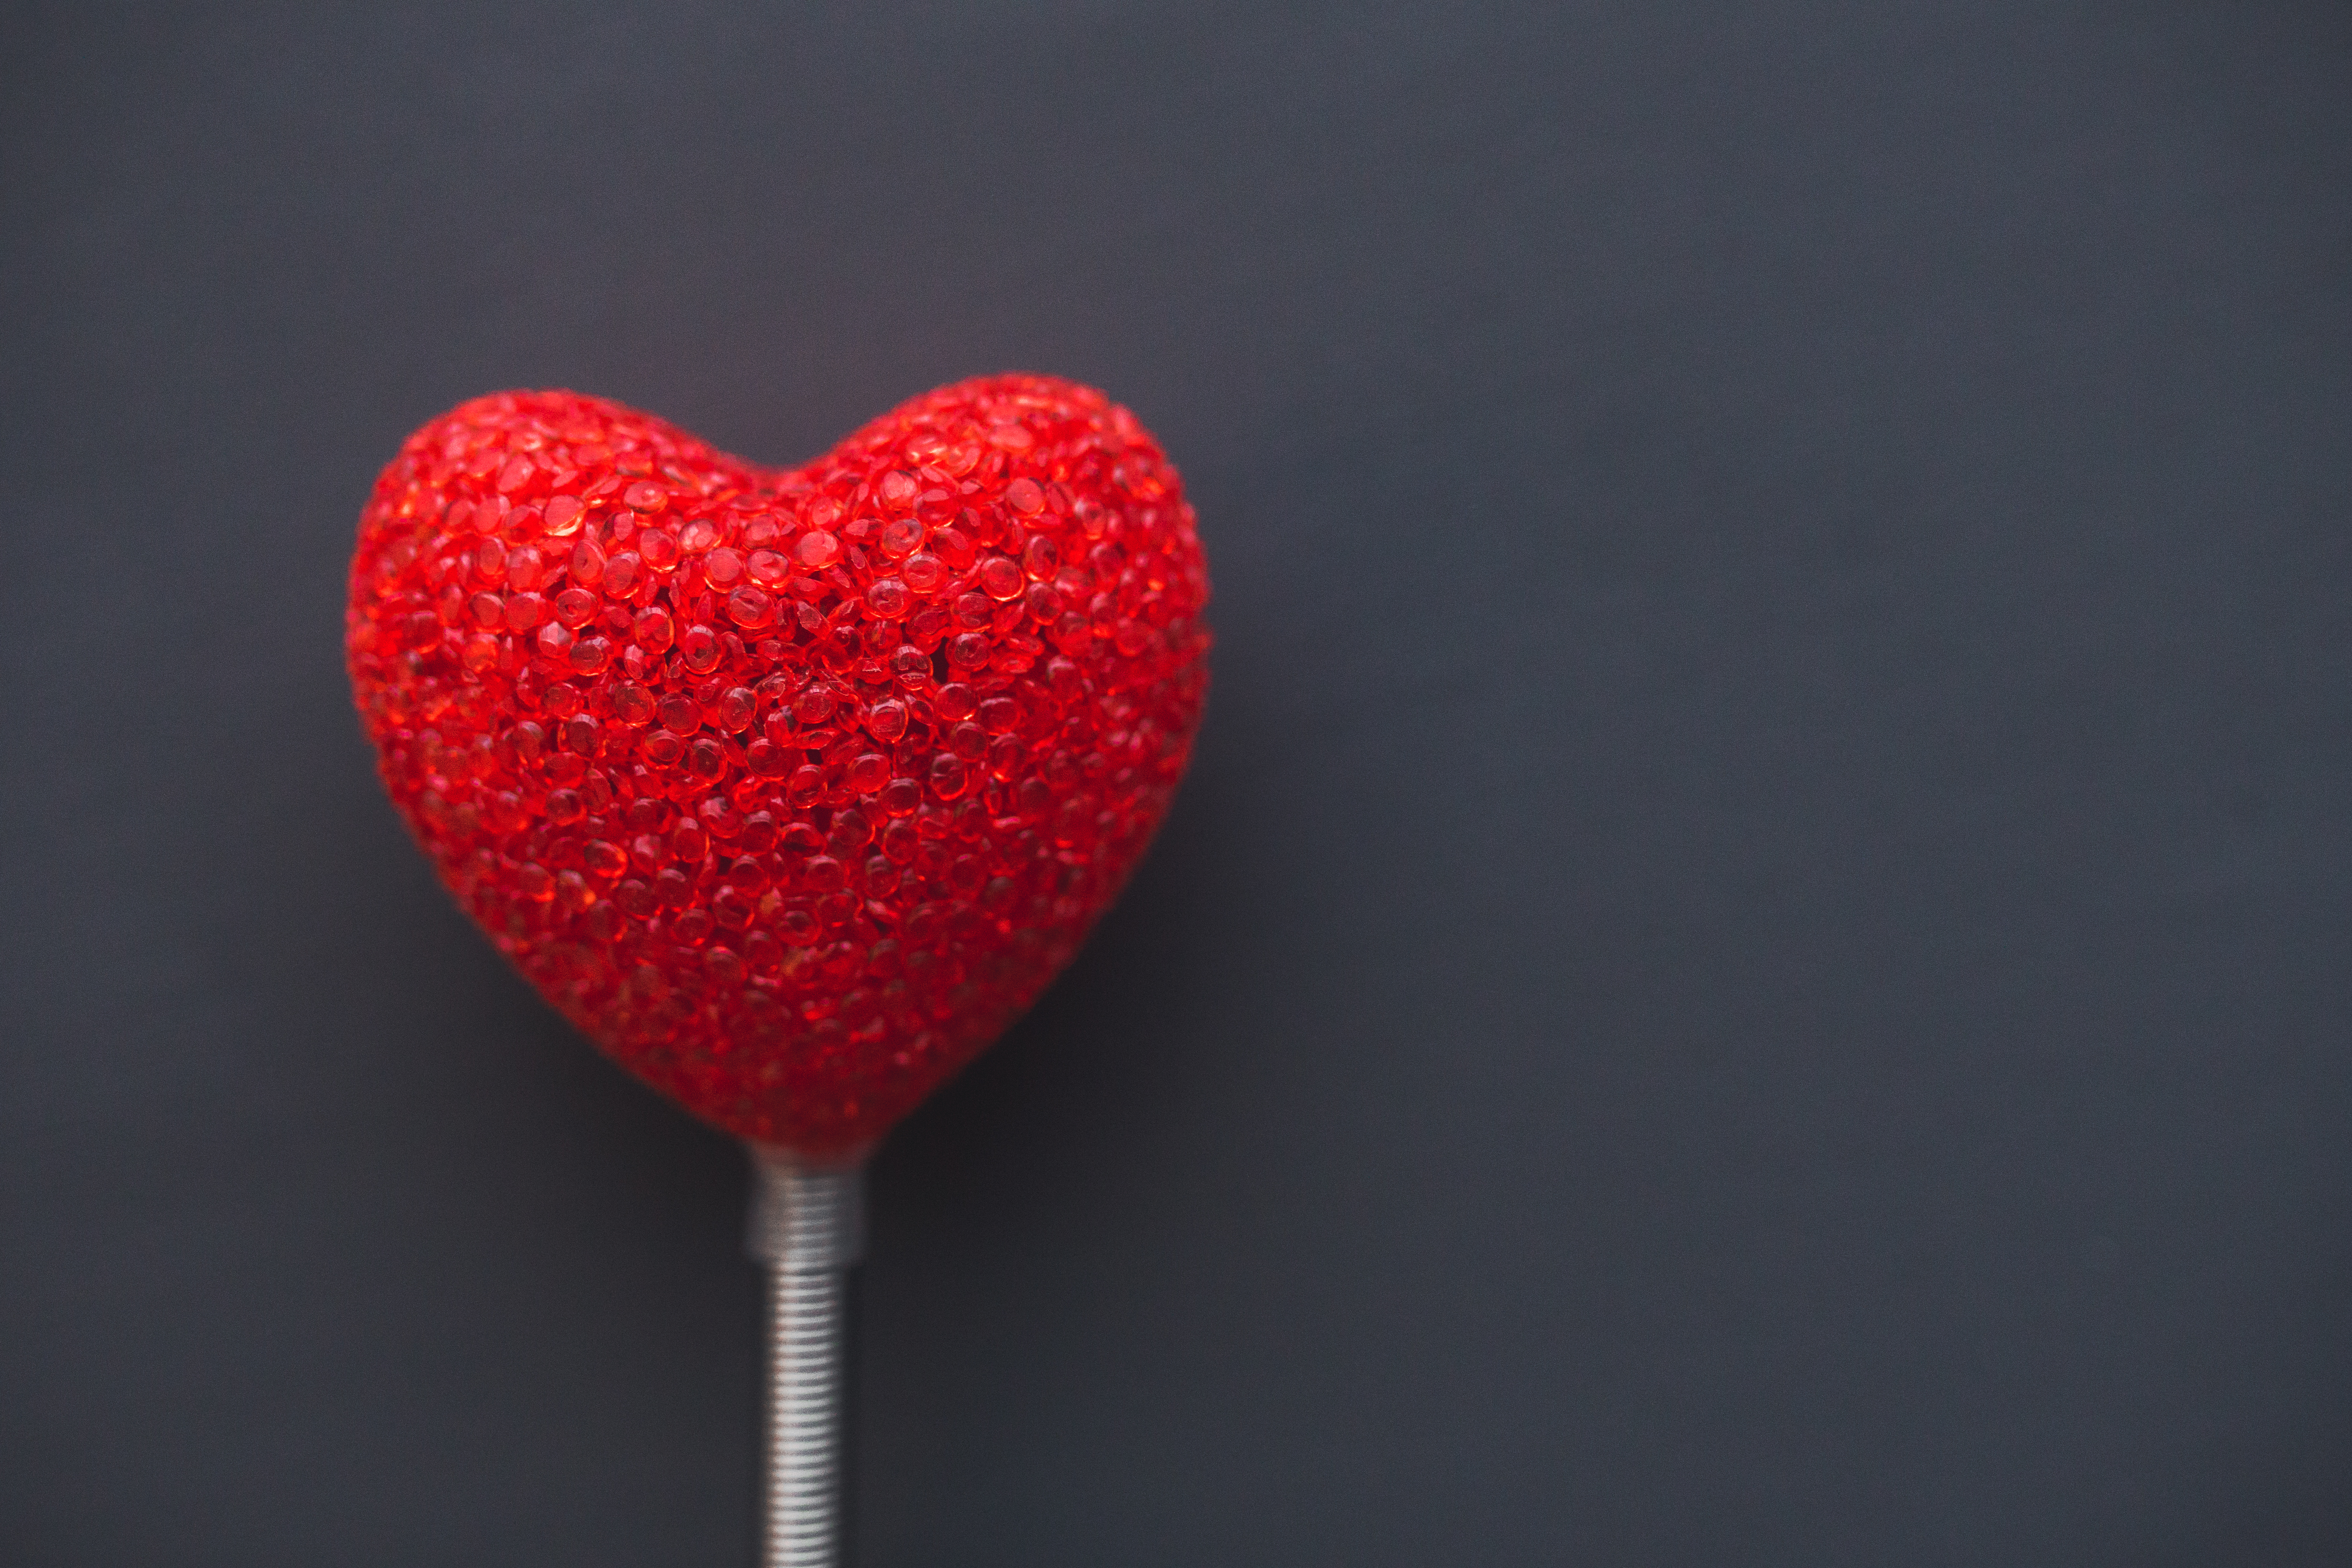 Free stock photos of heart · Pexels